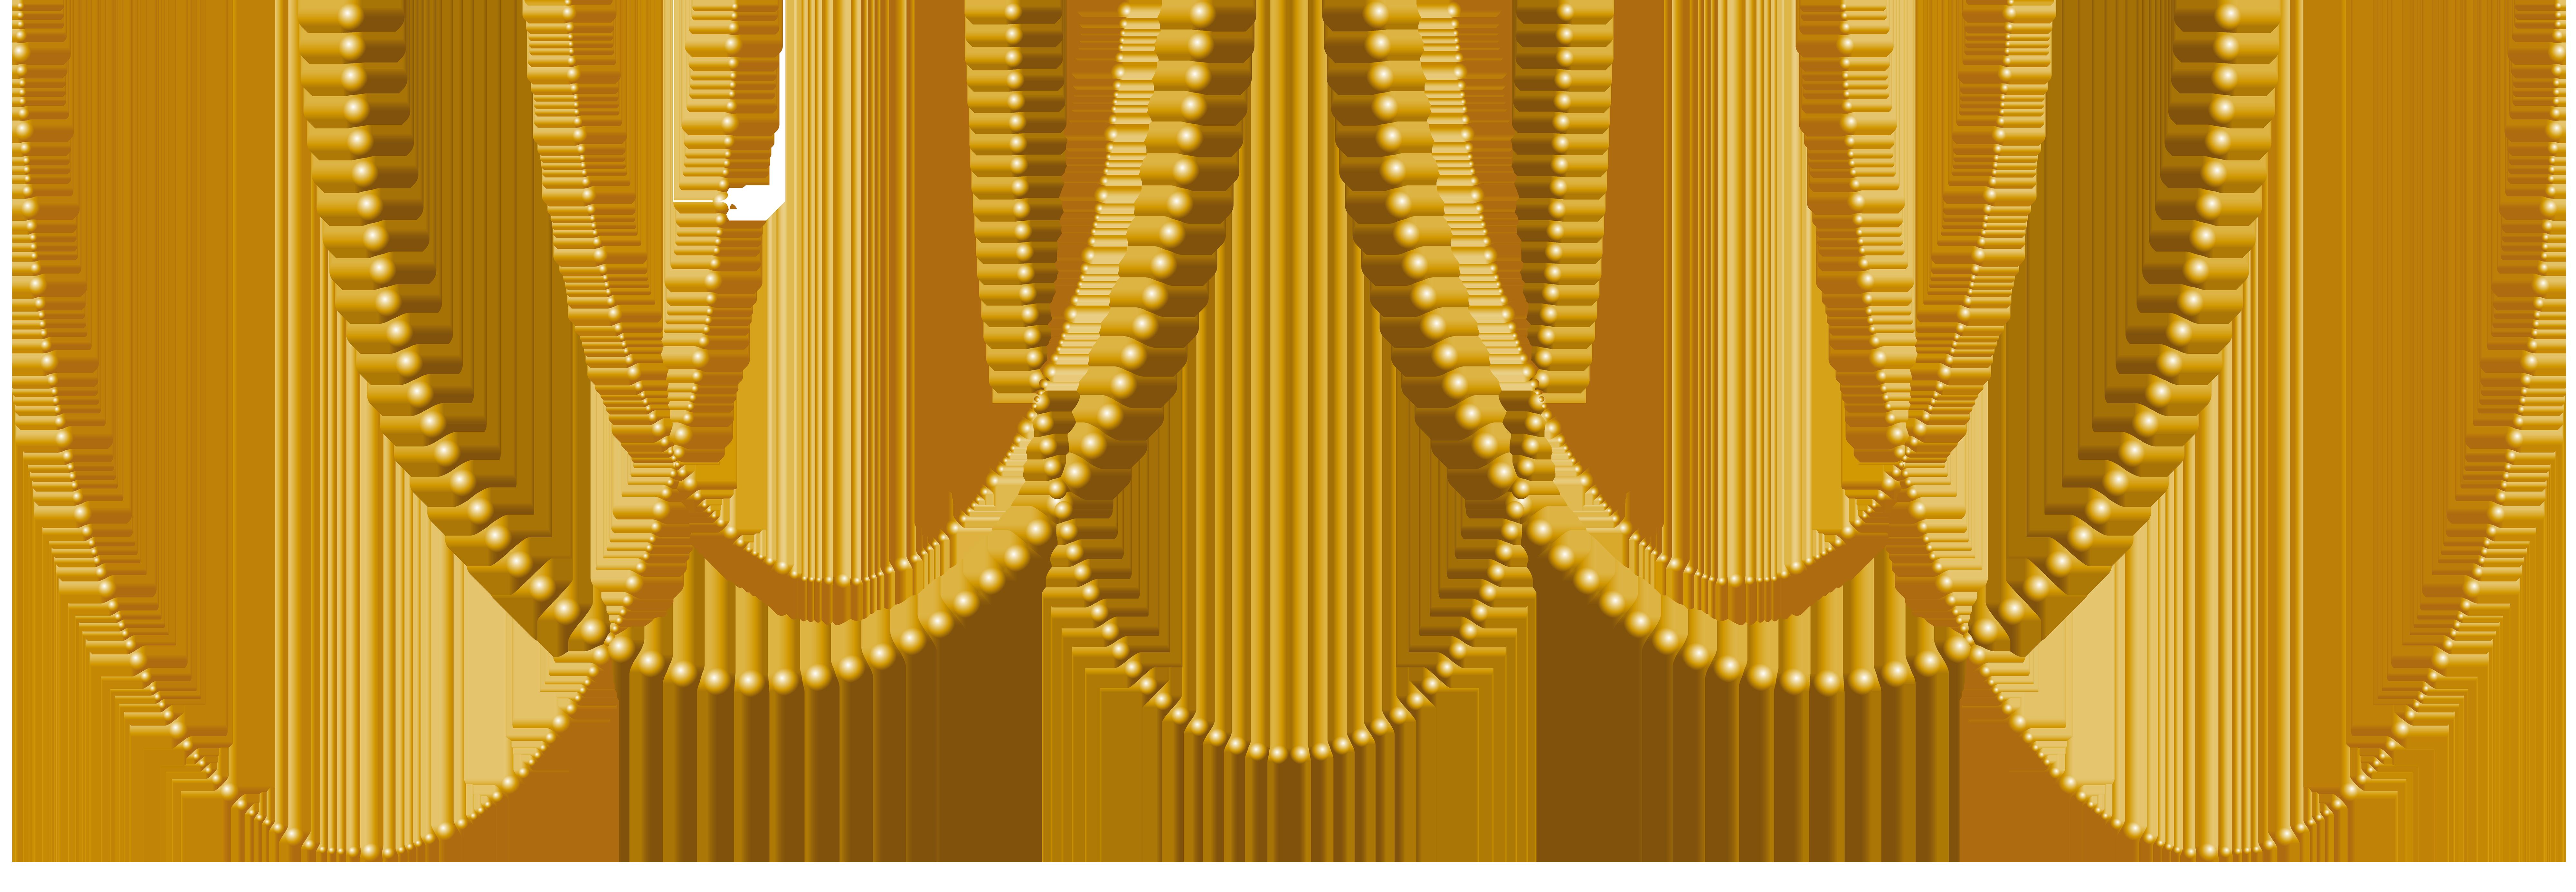 Deco gold pearls transparent. Pearl border png